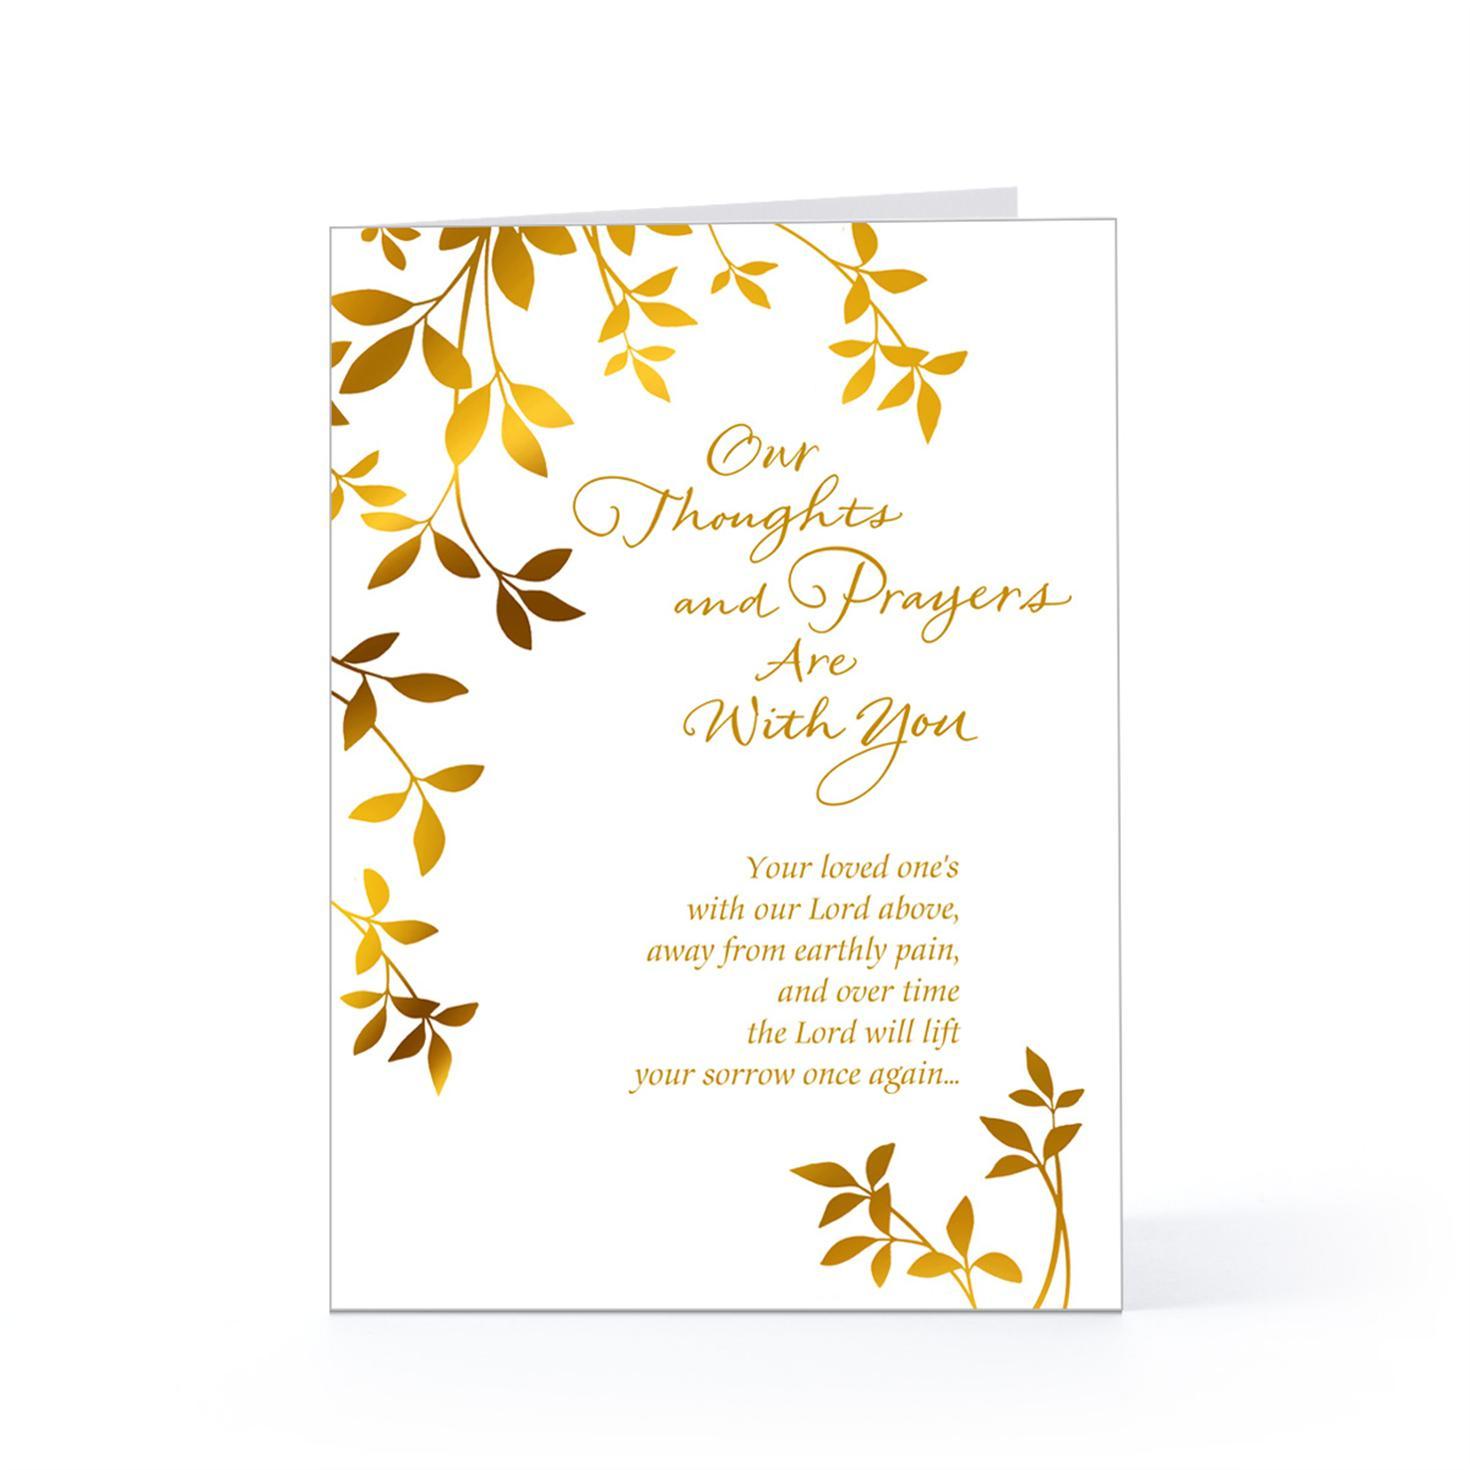 Printable Sympathy Cards - Hashtag Bg - Free Printable Sympathy Cards For Loss Of Dog